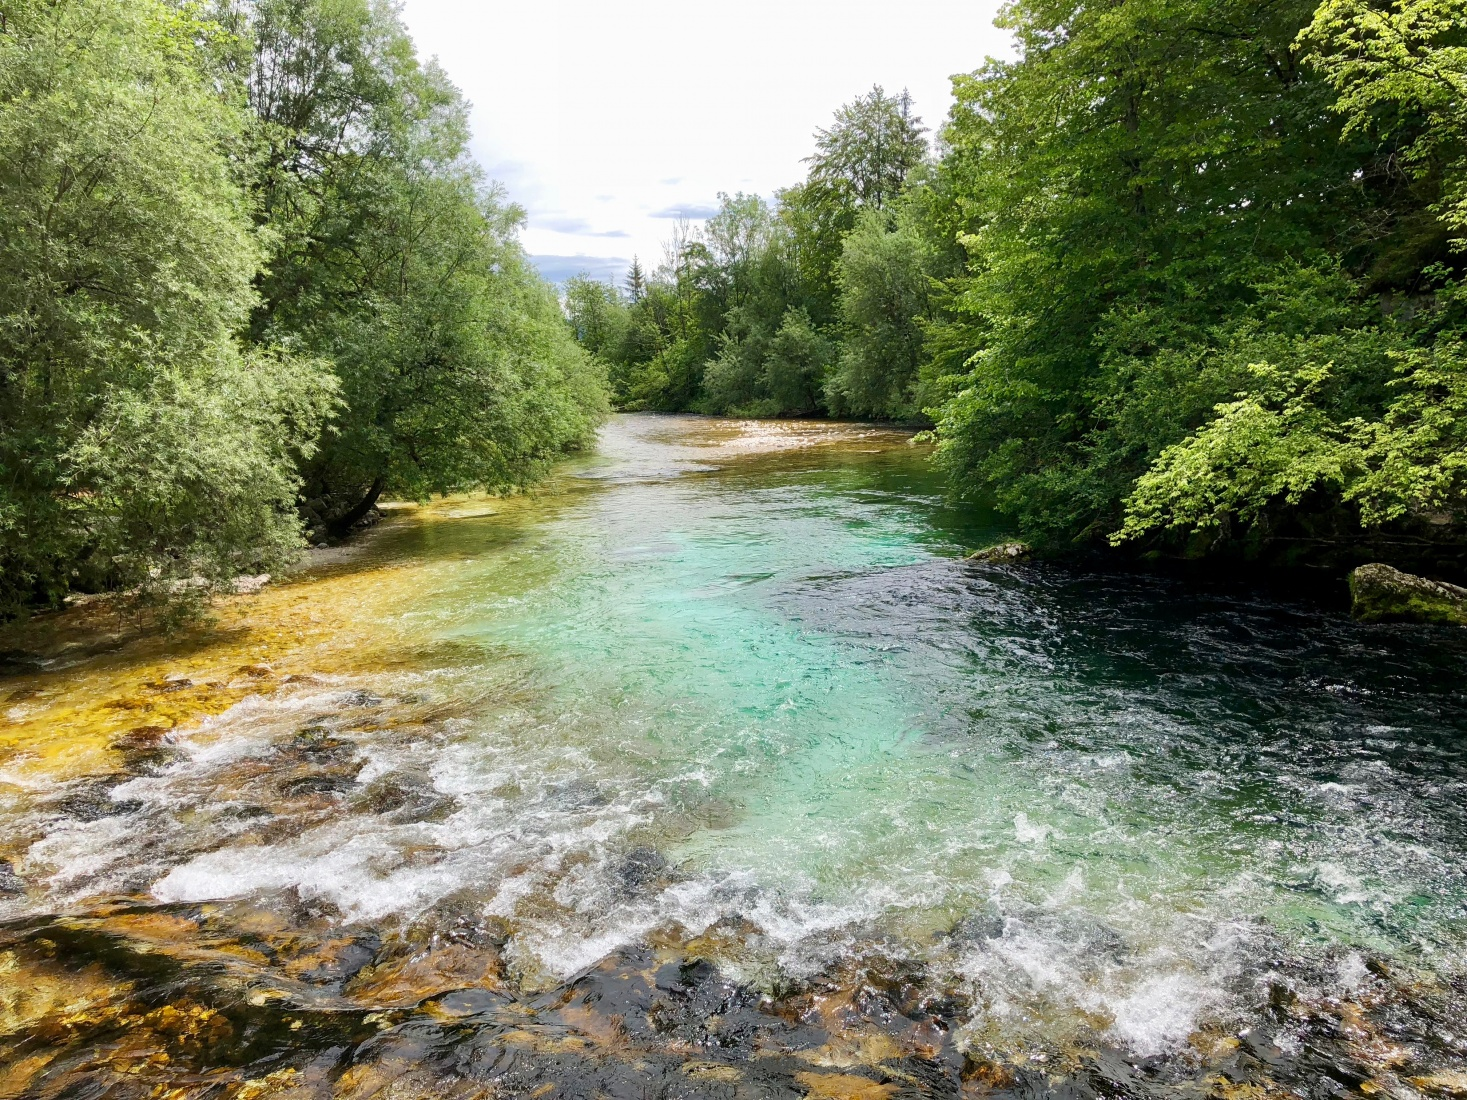 Blue-green water of Slovenian river Sava Bohinjka.